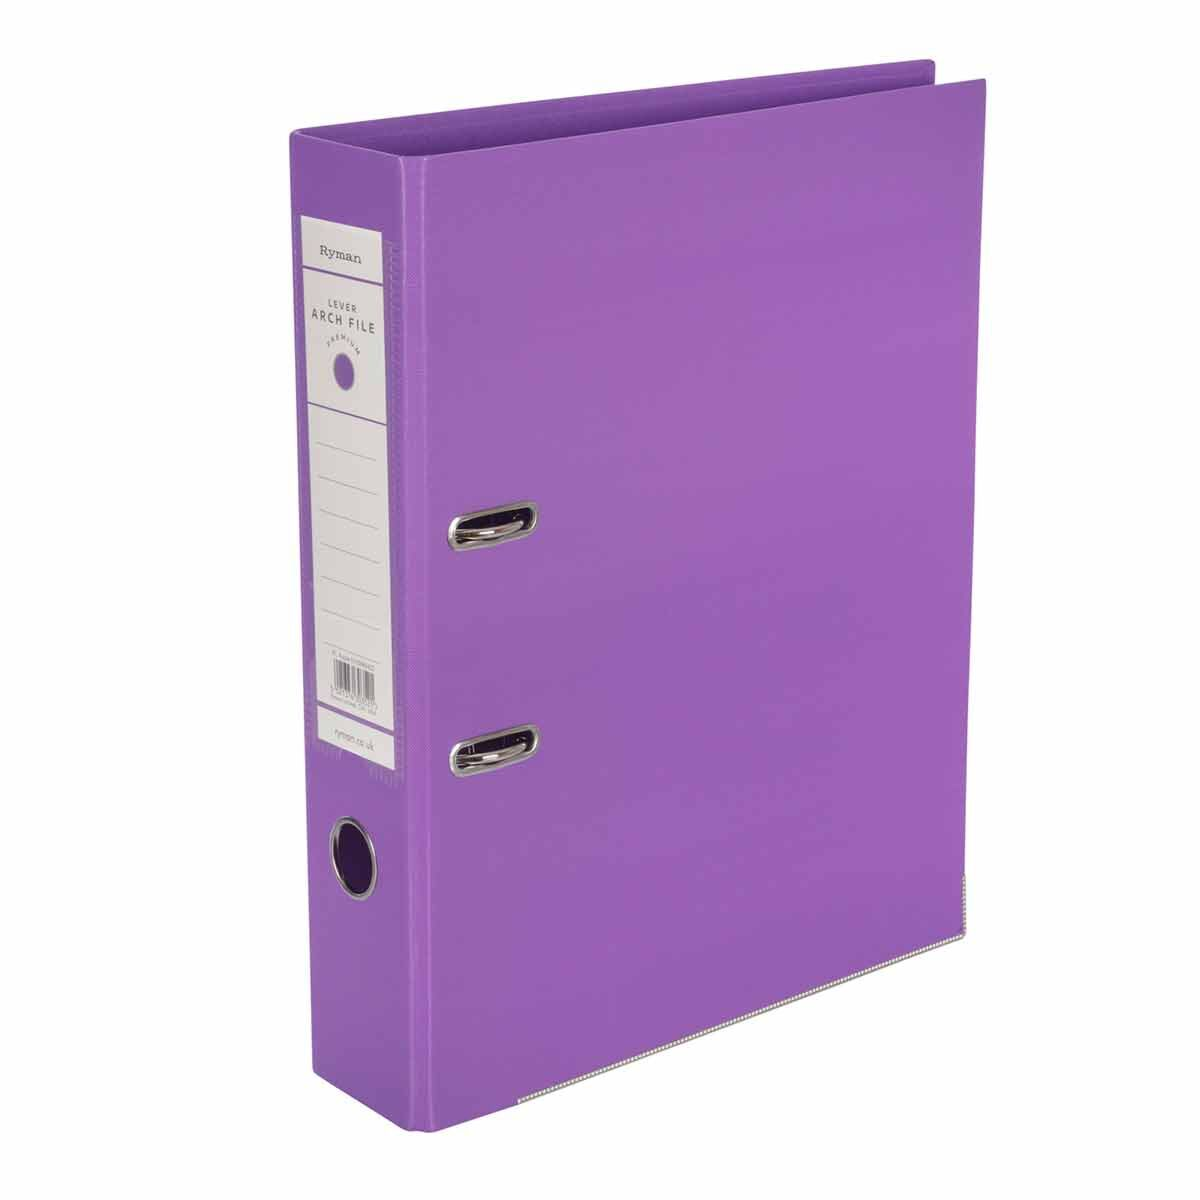 Ryman Premium Lever Arch File Foolscap Purple